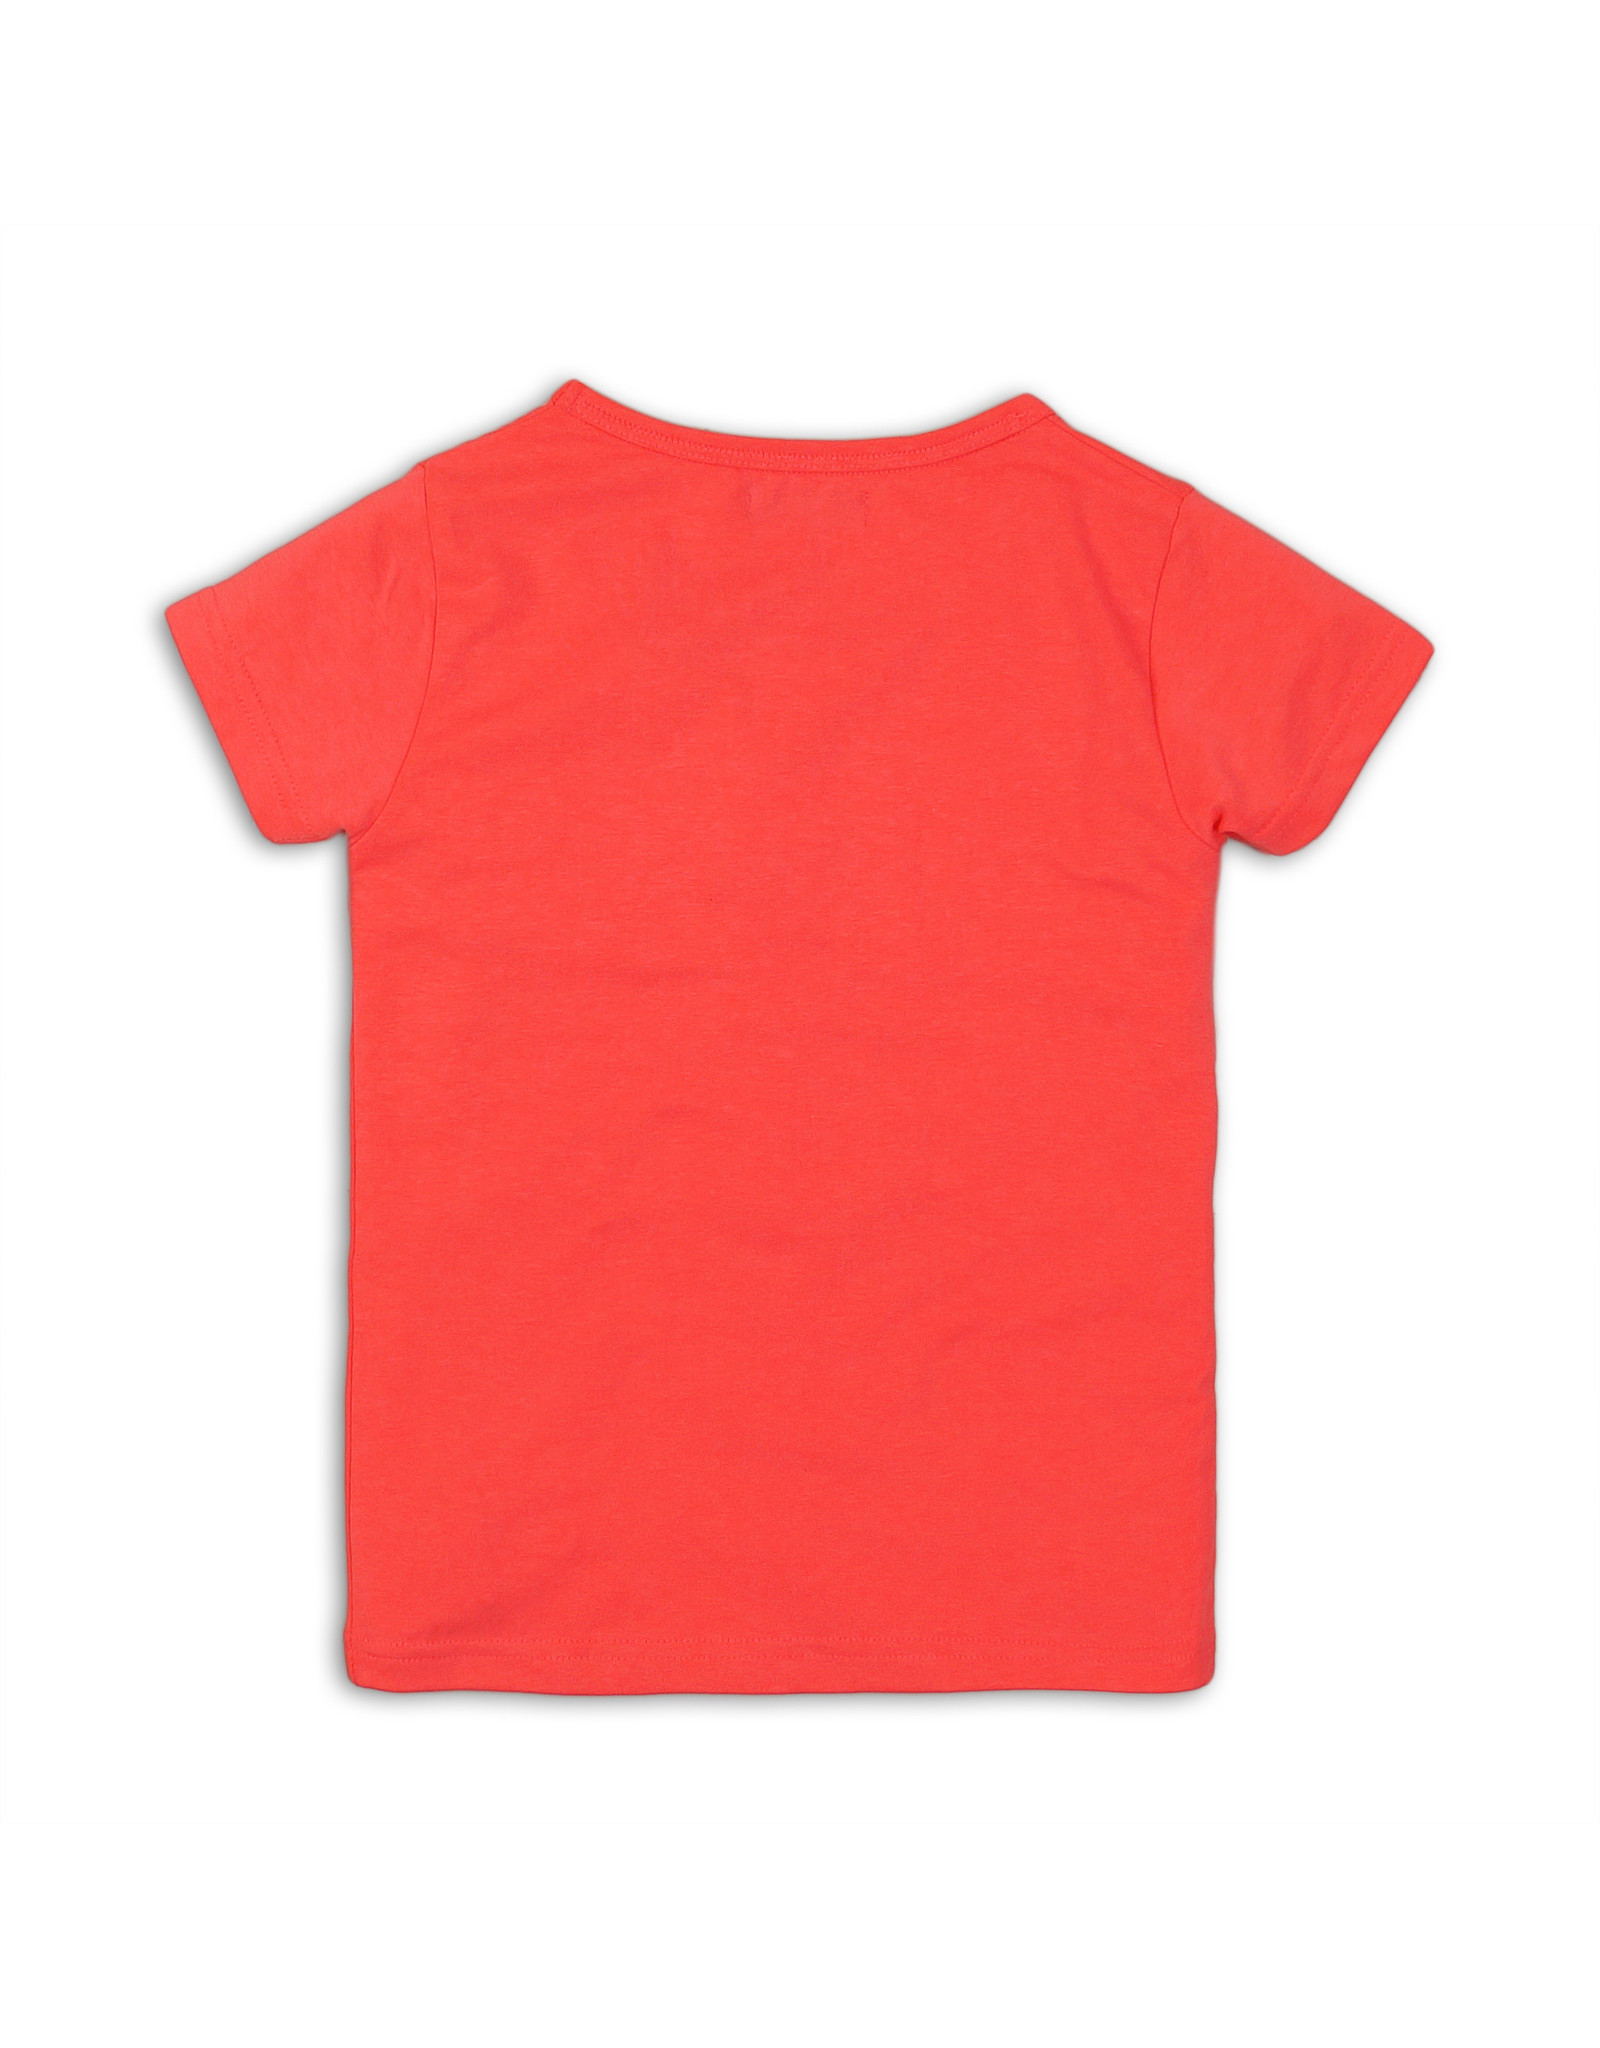 DJ Dutchjeans DJ Dutchjeans meisjes t-shirt Stay Chic Neon Pink